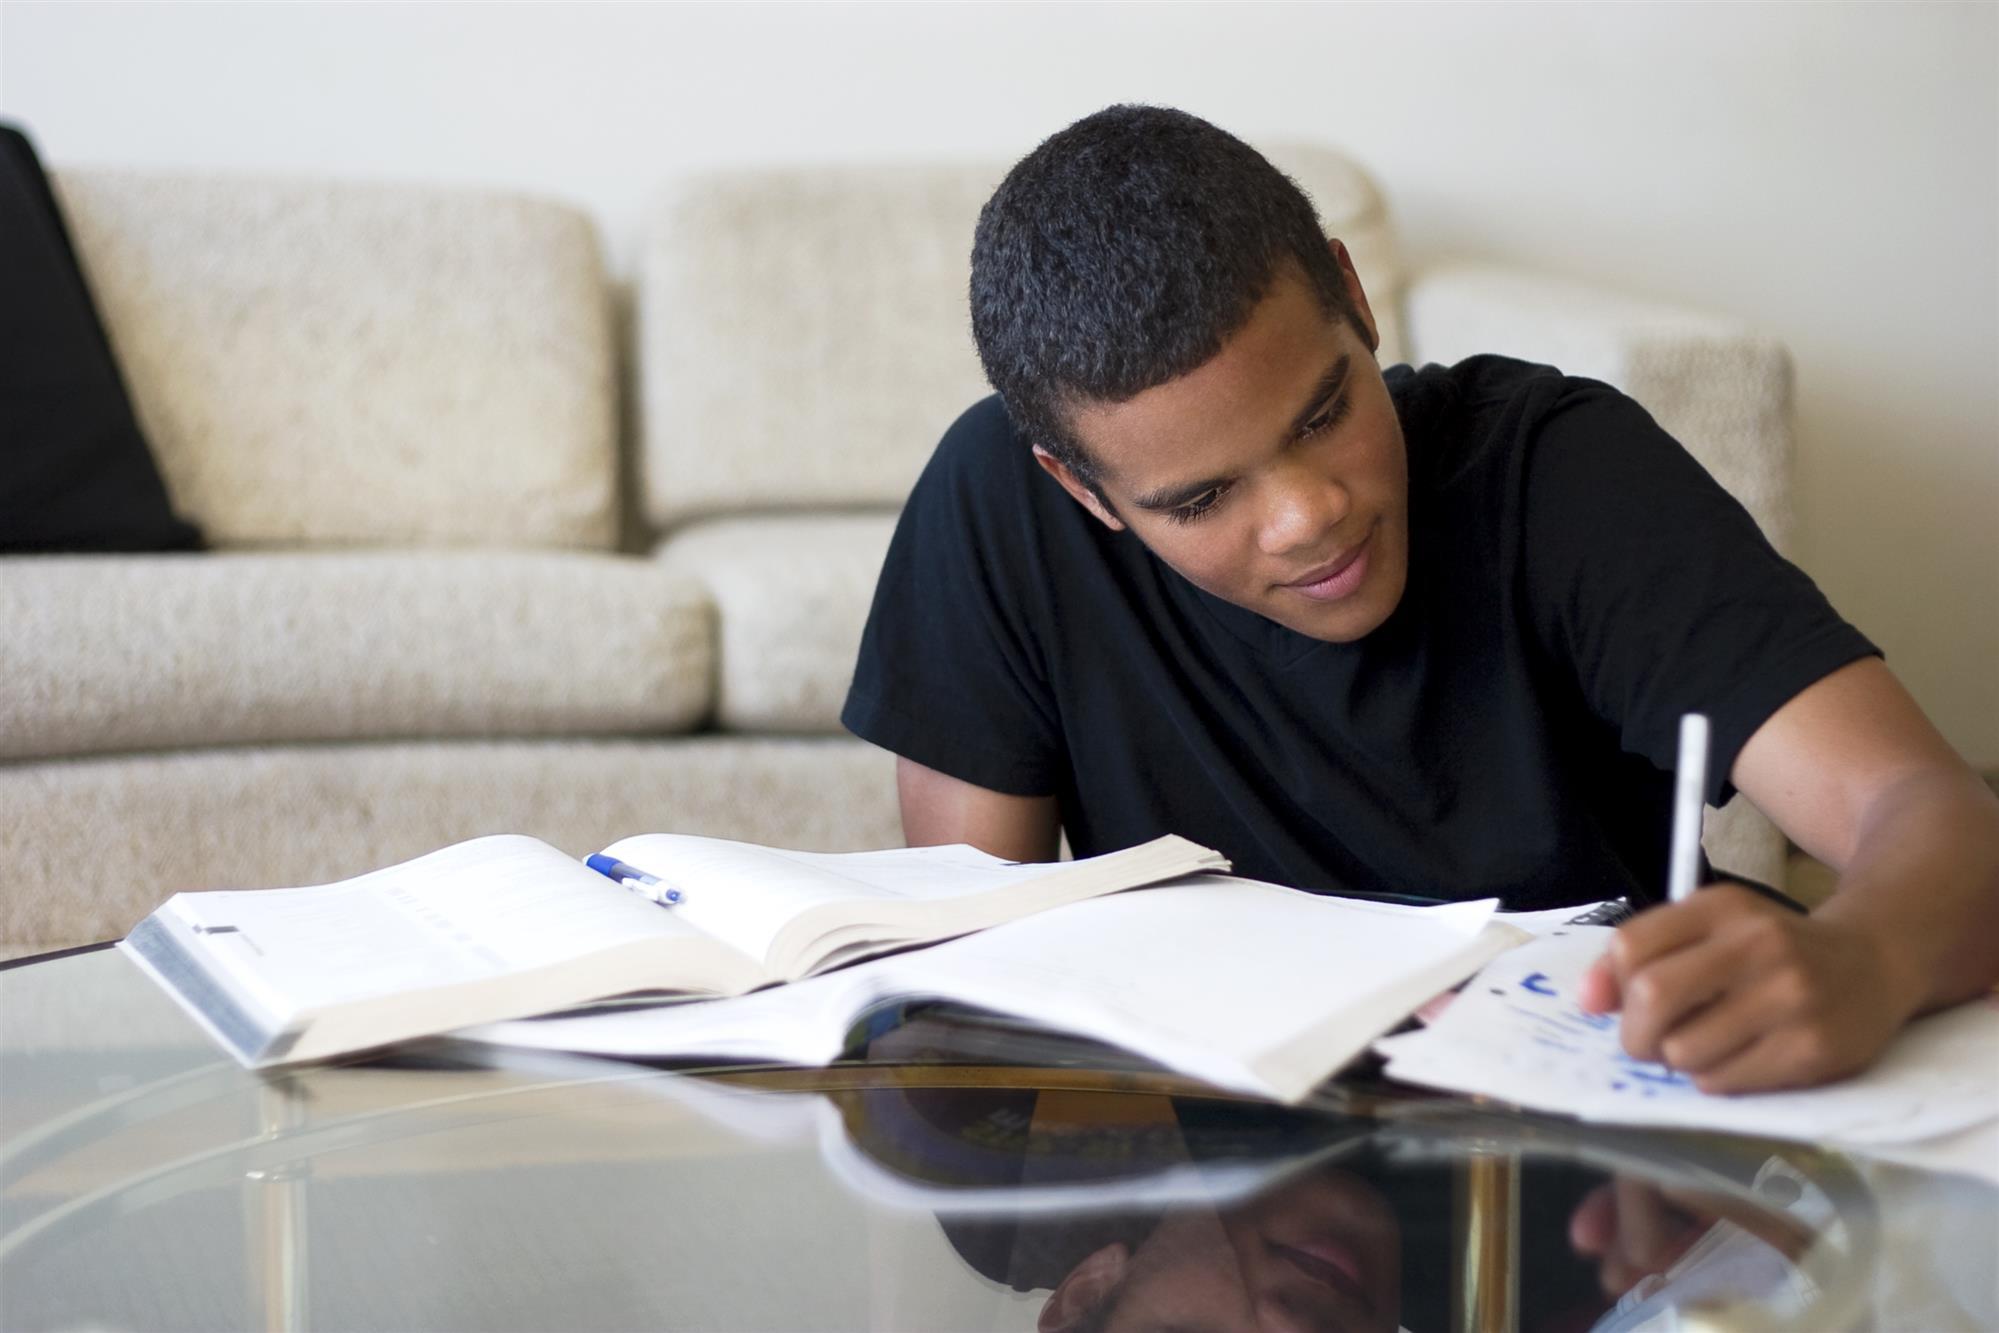 teenager not doing homework